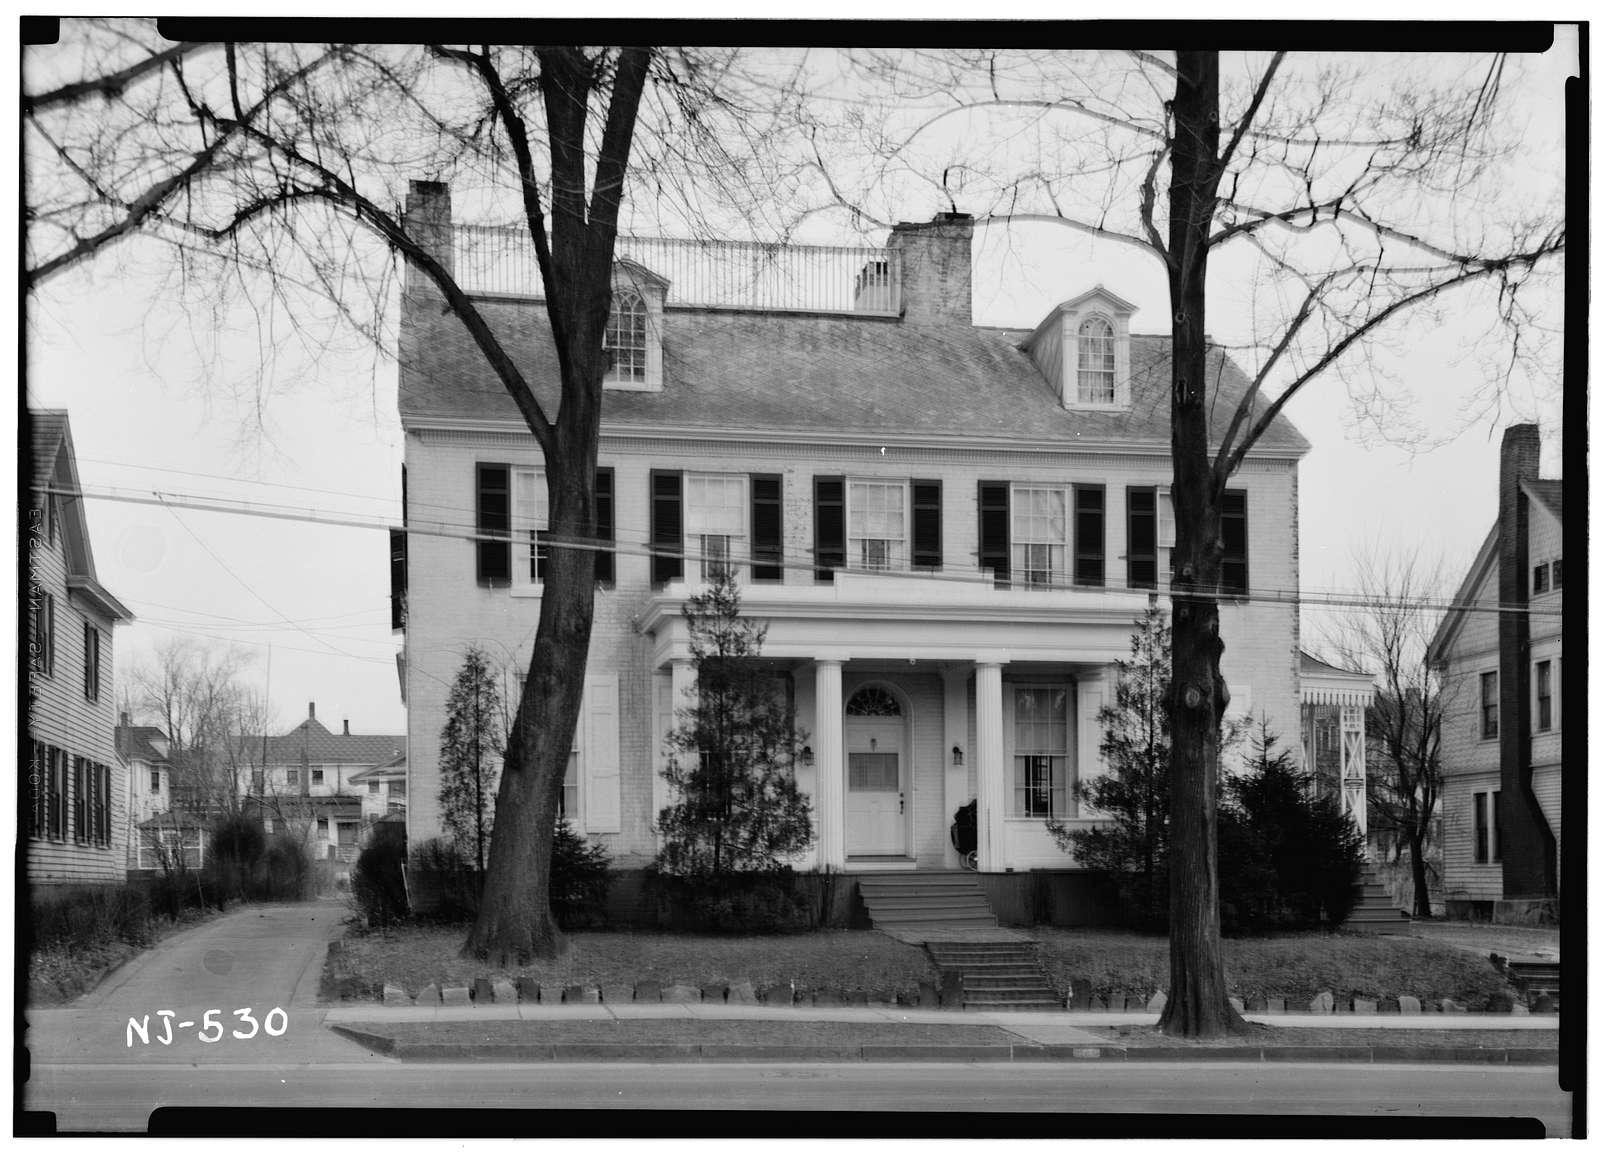 Buck-Elmer House, 297 East Commerce Street, Bridgeton, Cumberland County, NJ